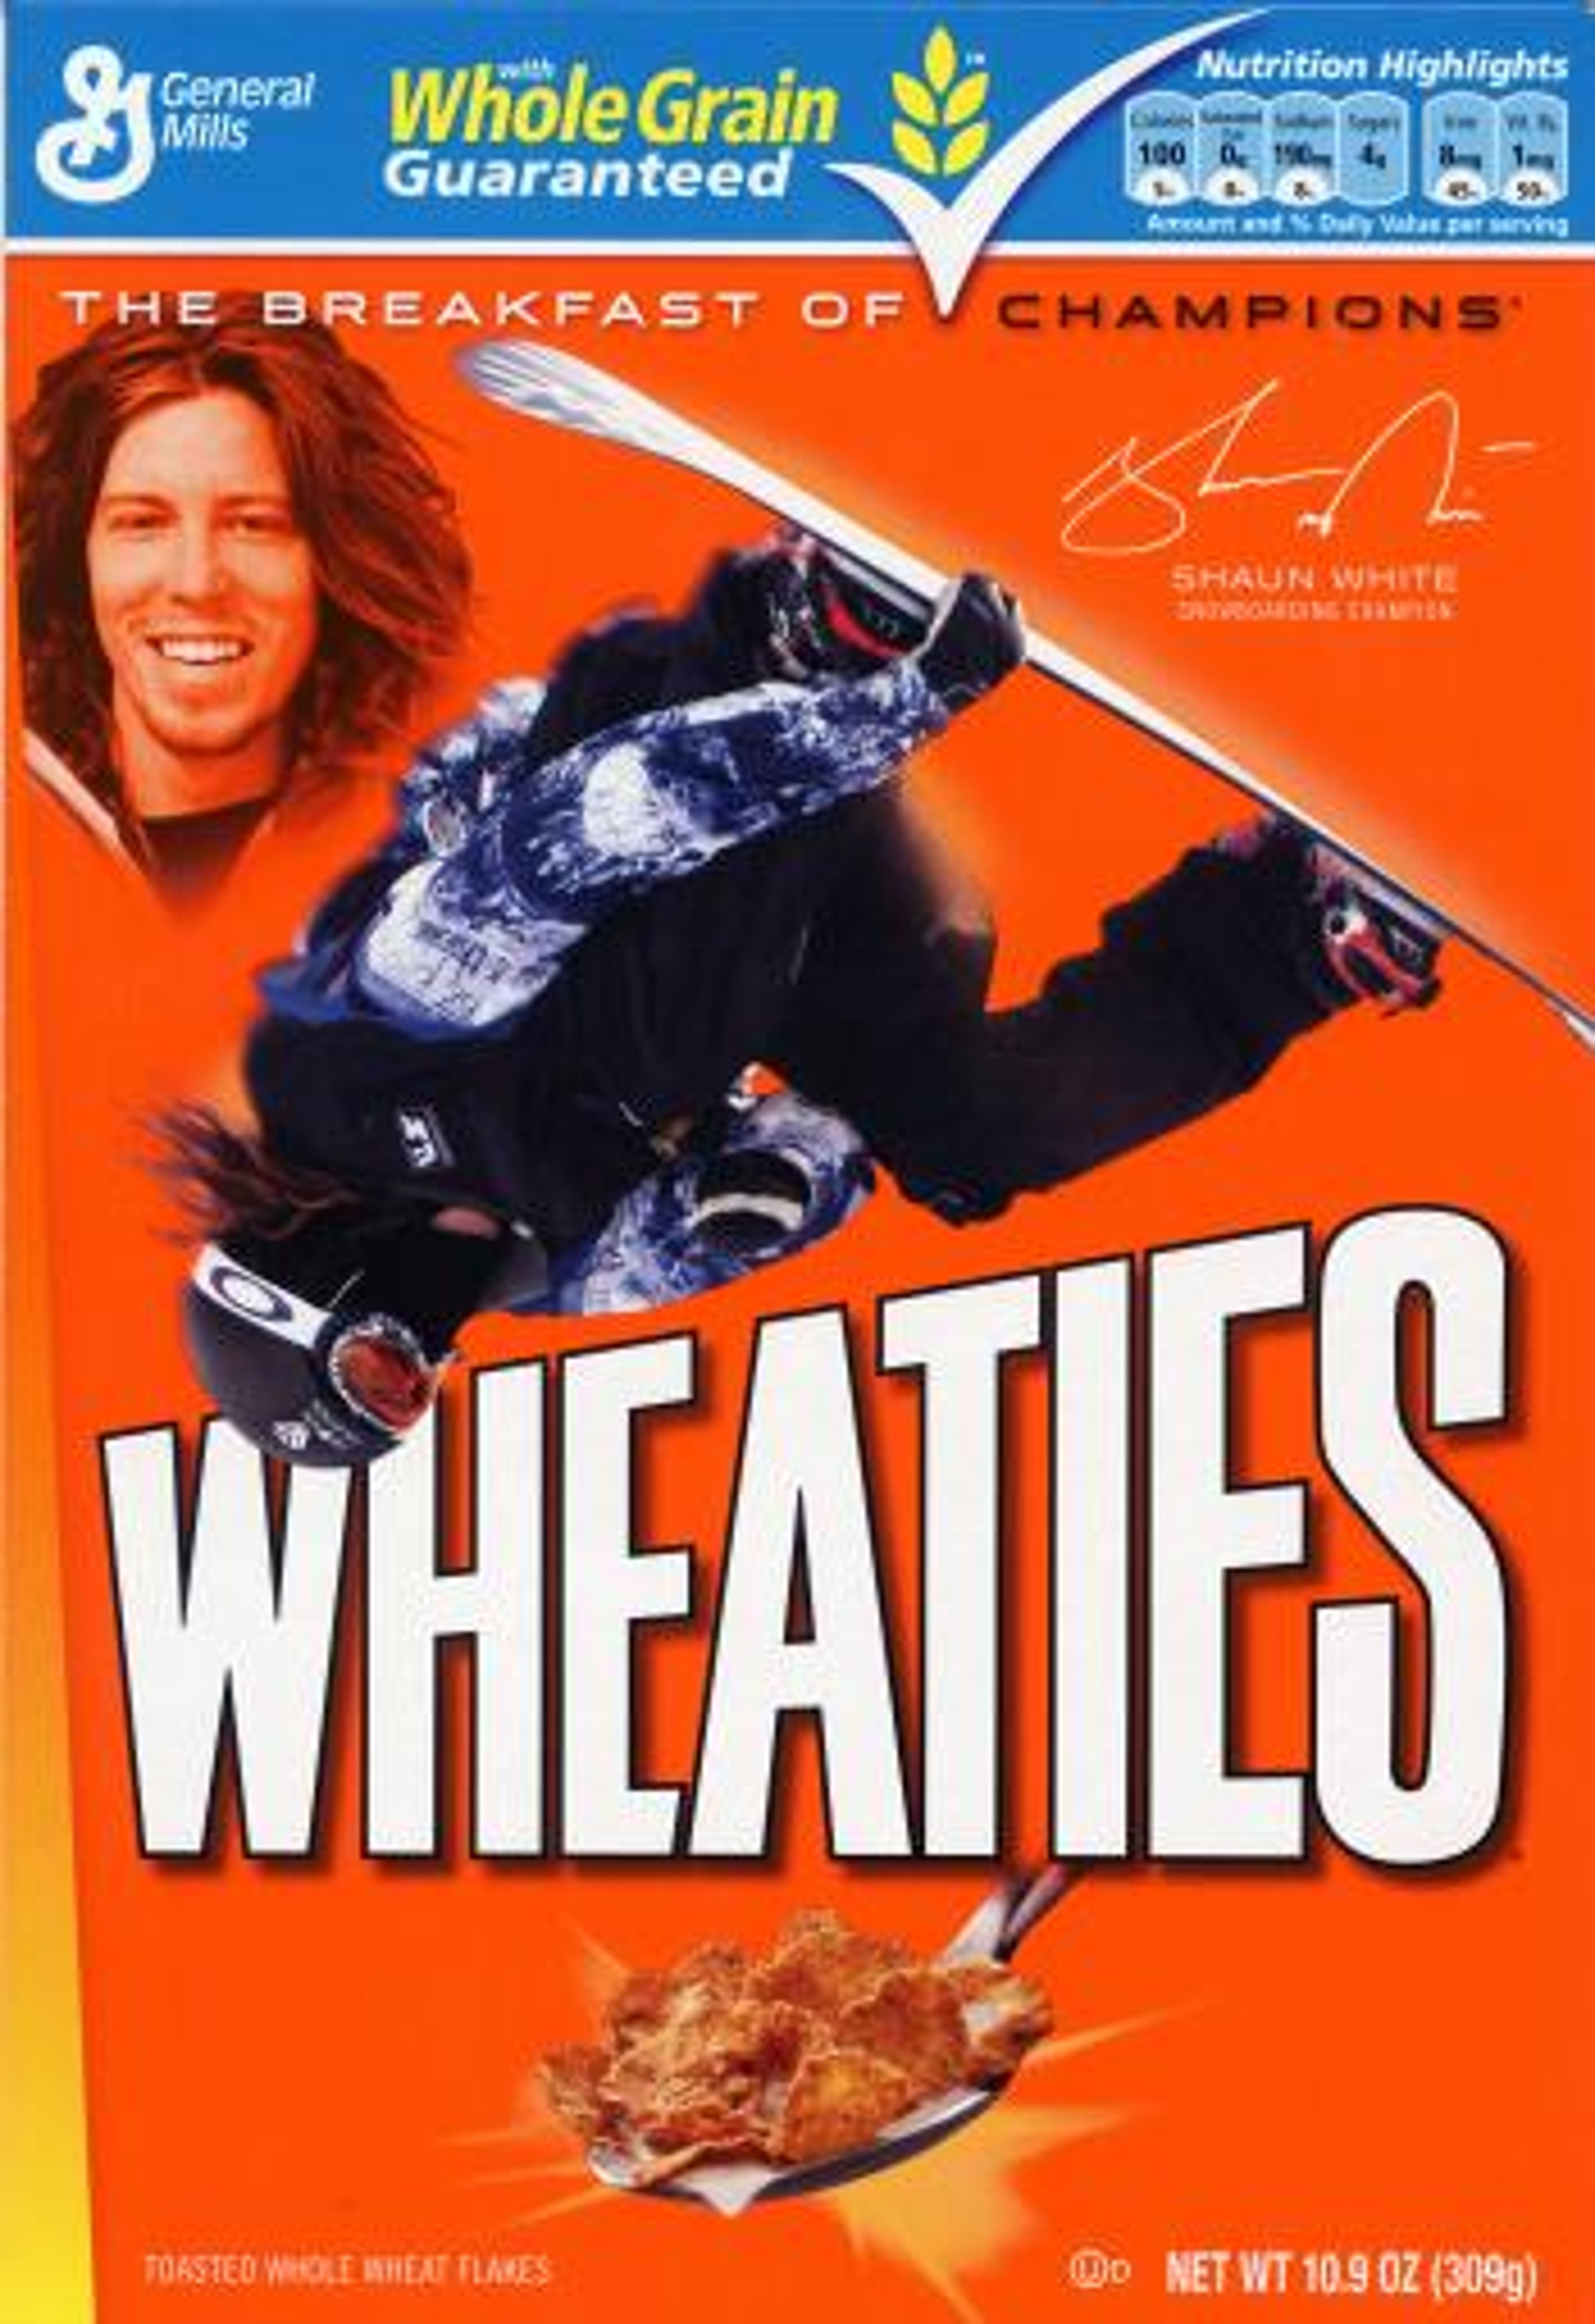 Shaun White on the Wheaties box.